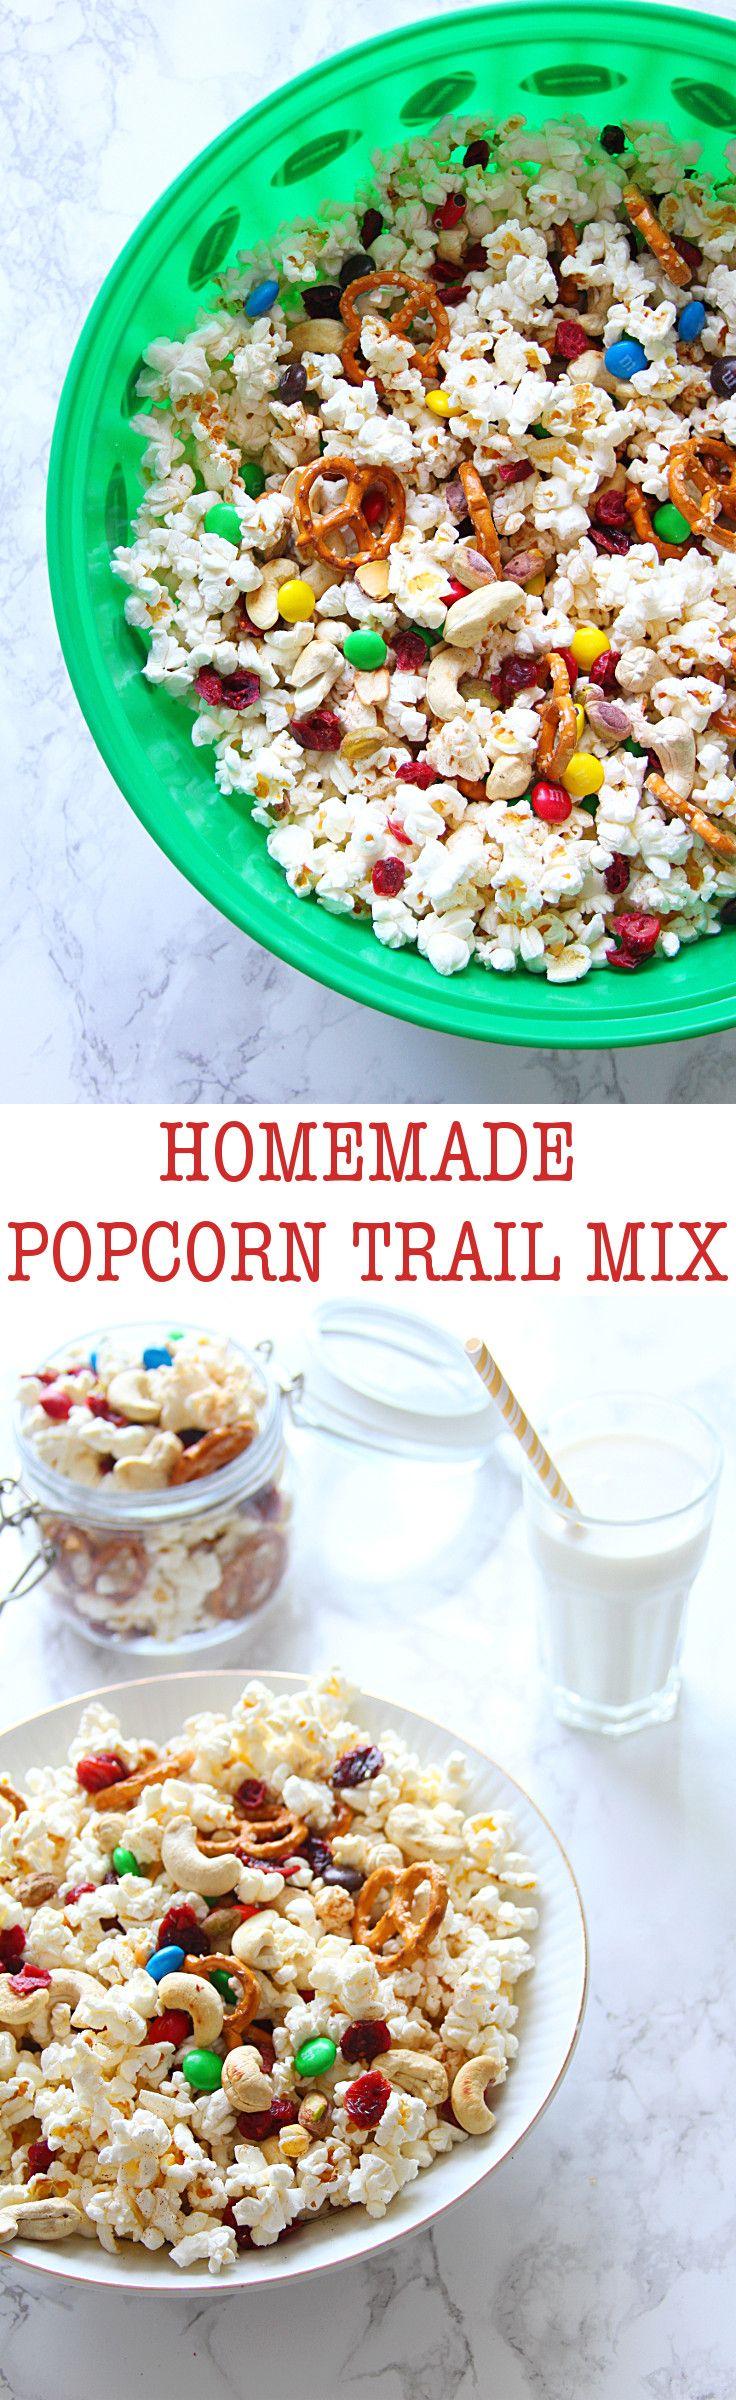 Popcorn trail mixes on Pinterest | Kids snack mix, Trails end popcorn ...